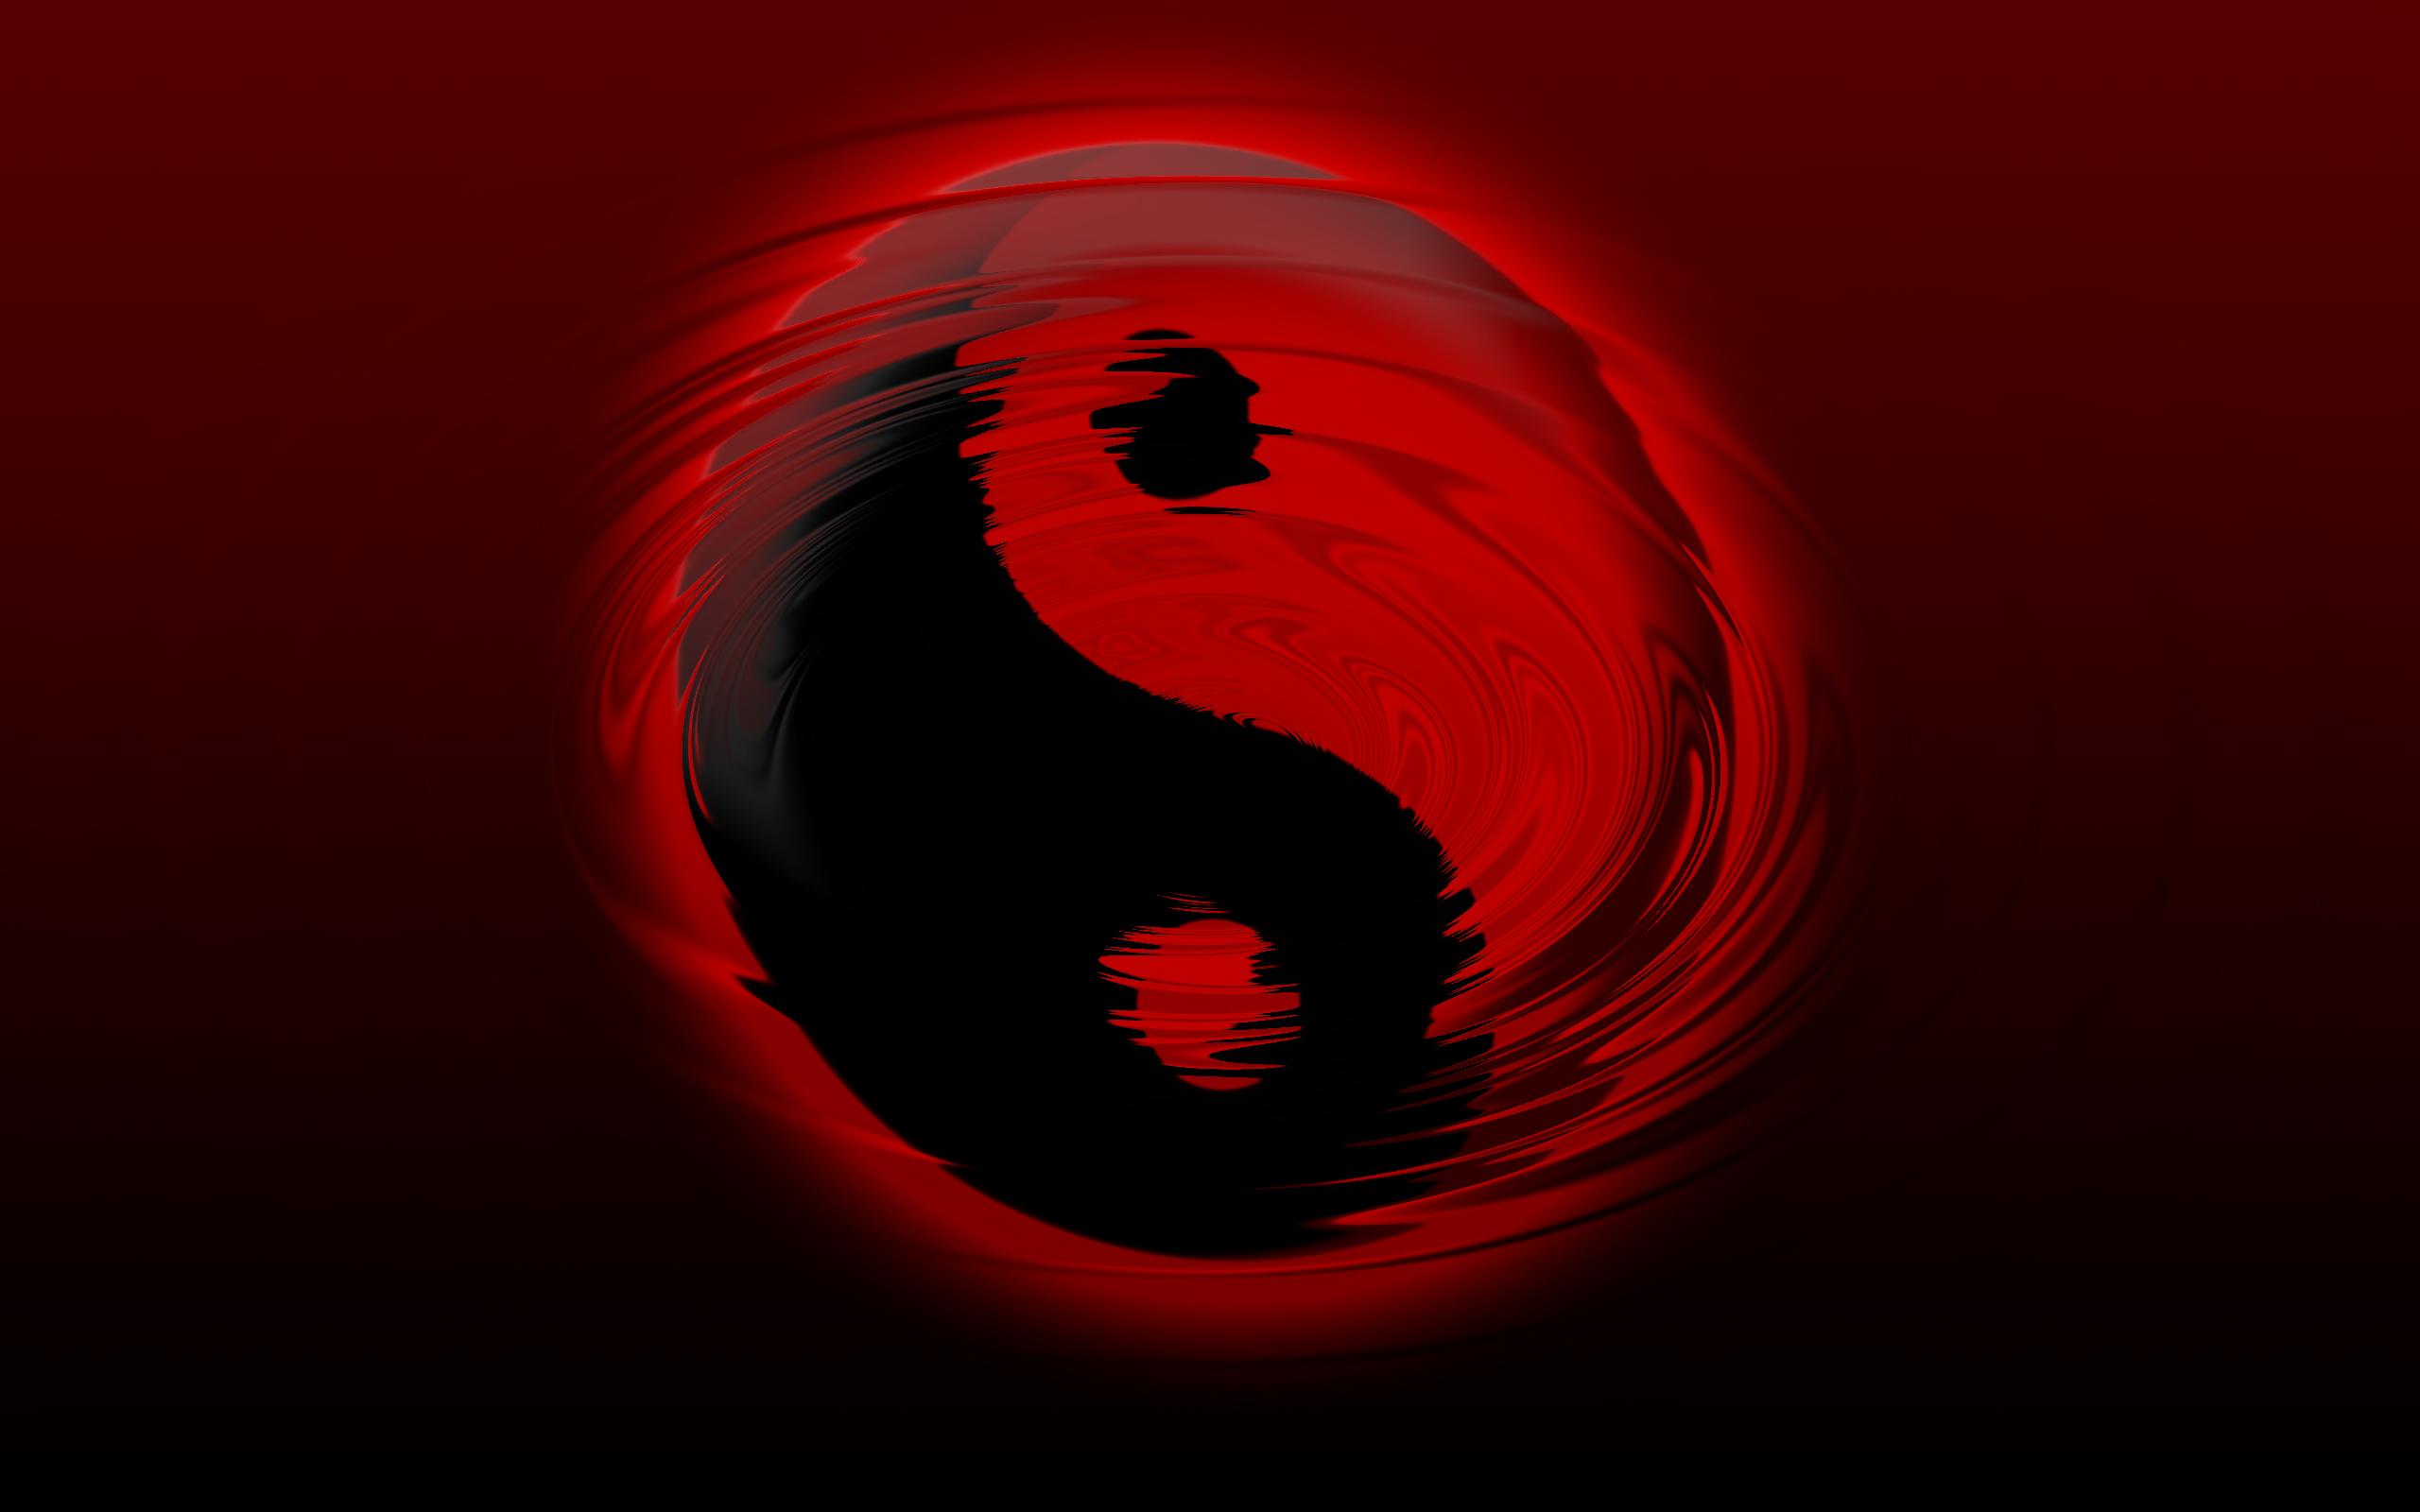 Wallpaper #100 Yin Yang Ripple | Red and Black Wallpapers